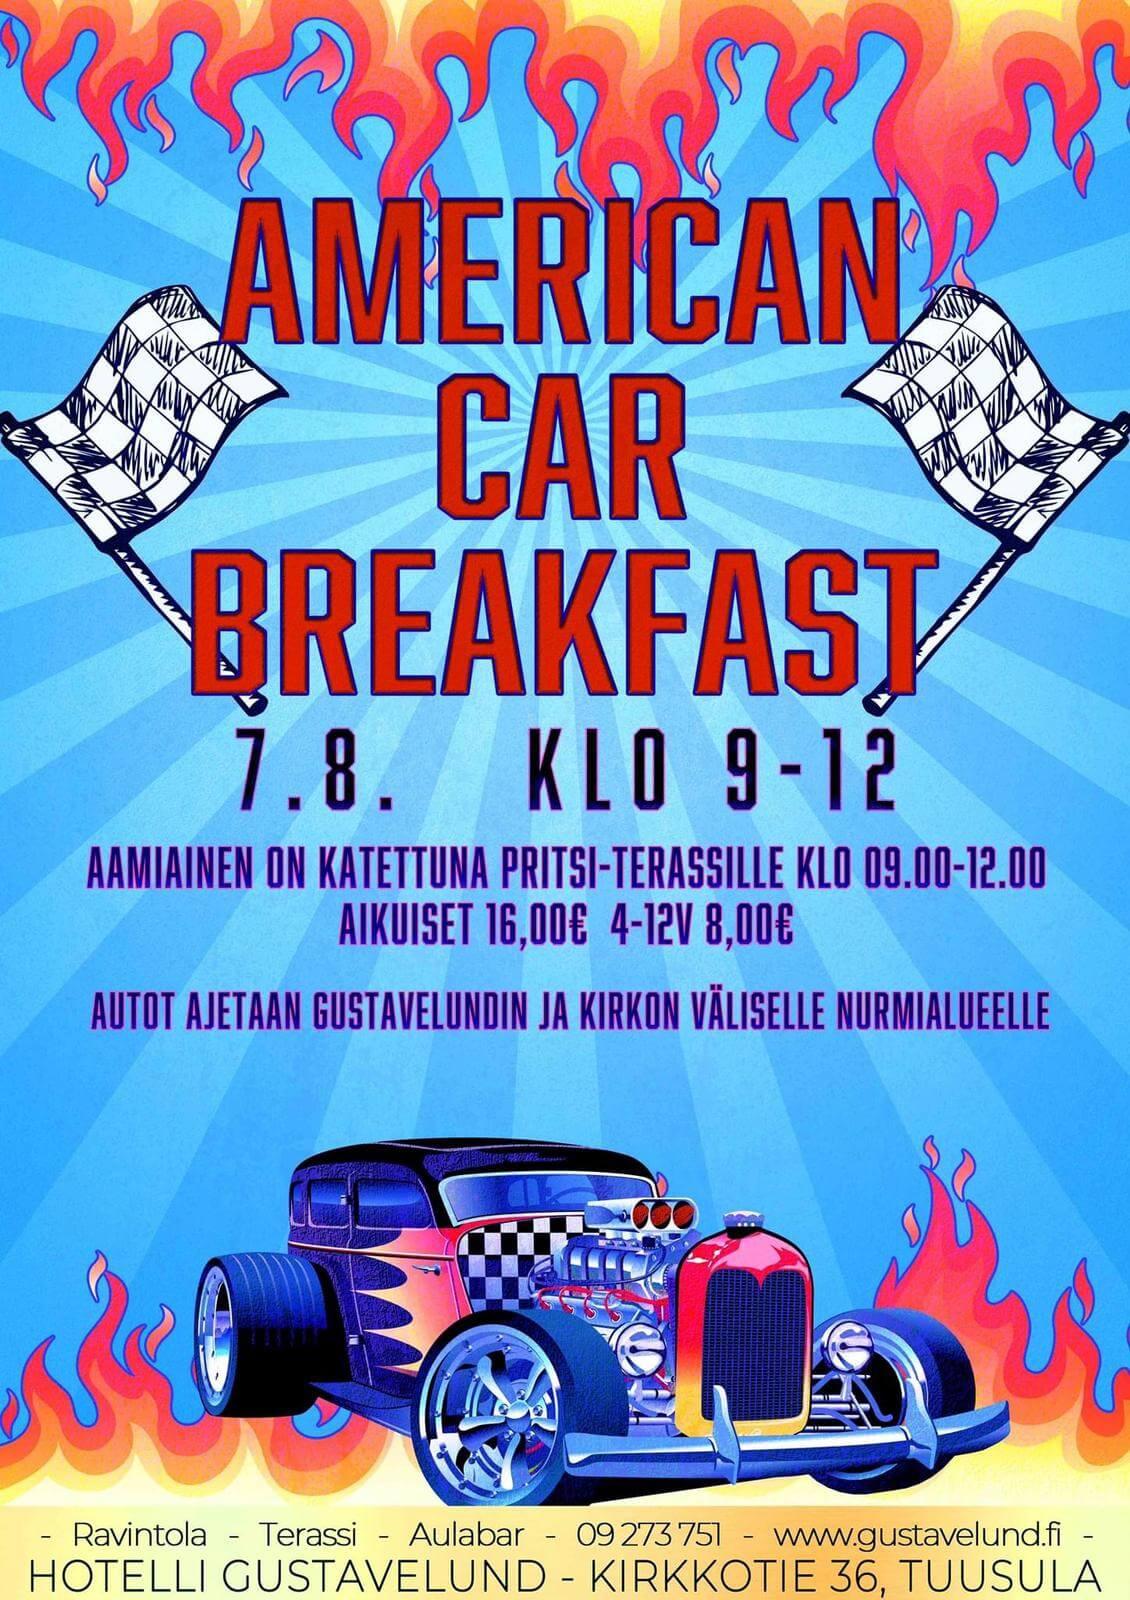 American Car breakfast 7.8.2021